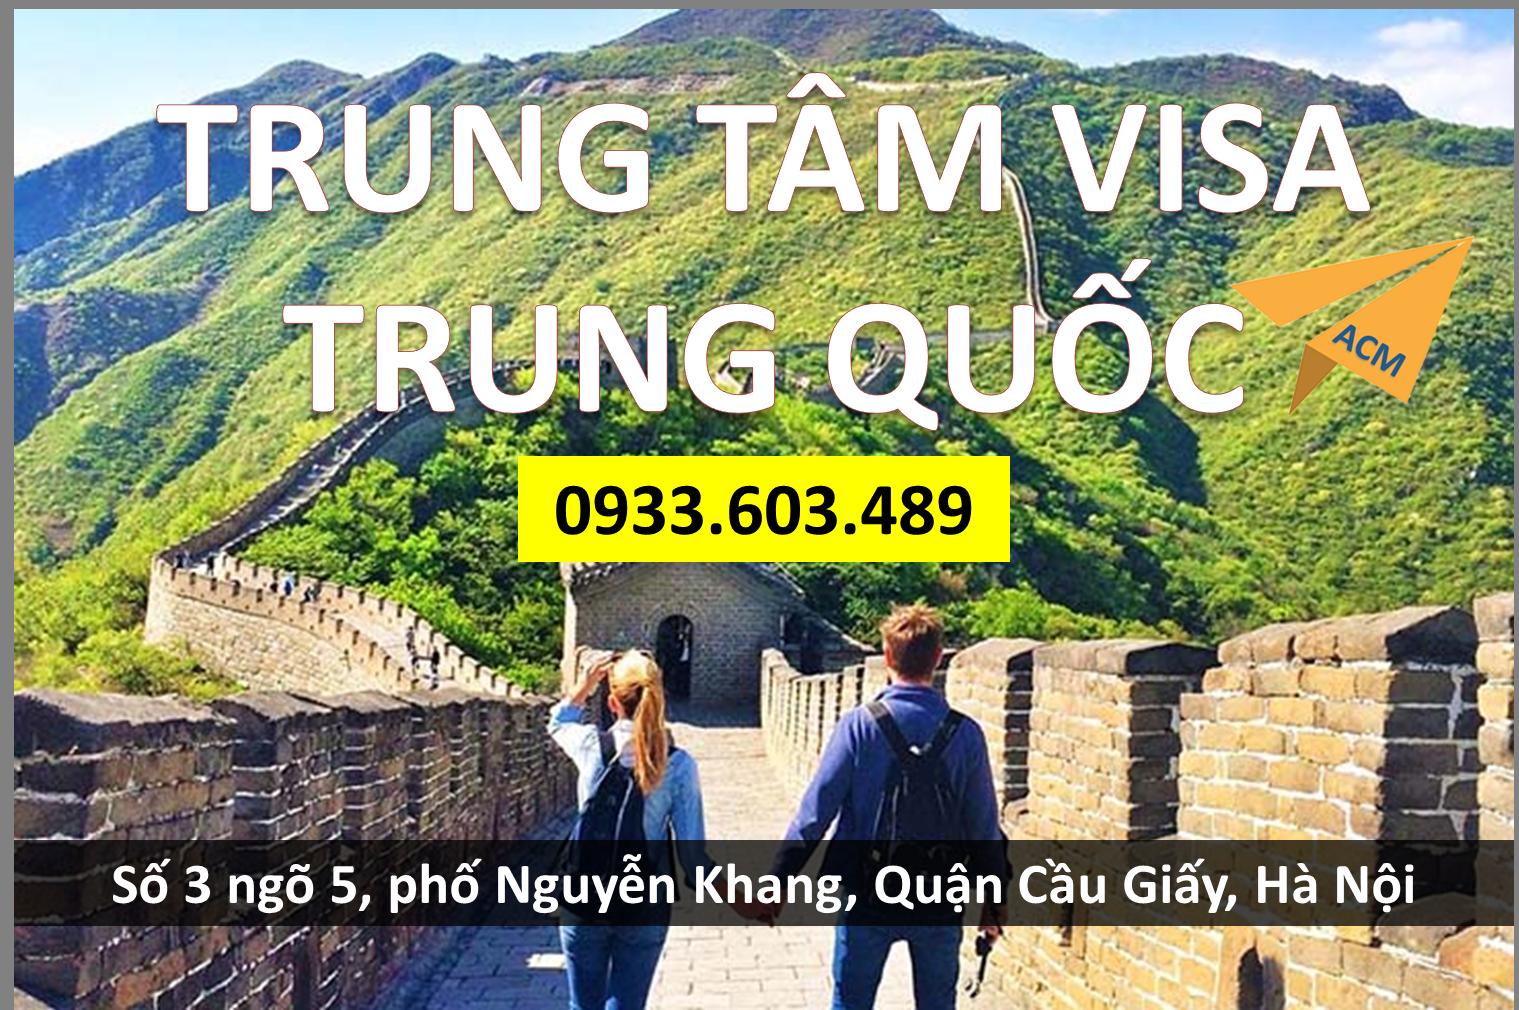 Dich vu lam nhanh Visa Trung Quoc cho khach hang tai Da Nang